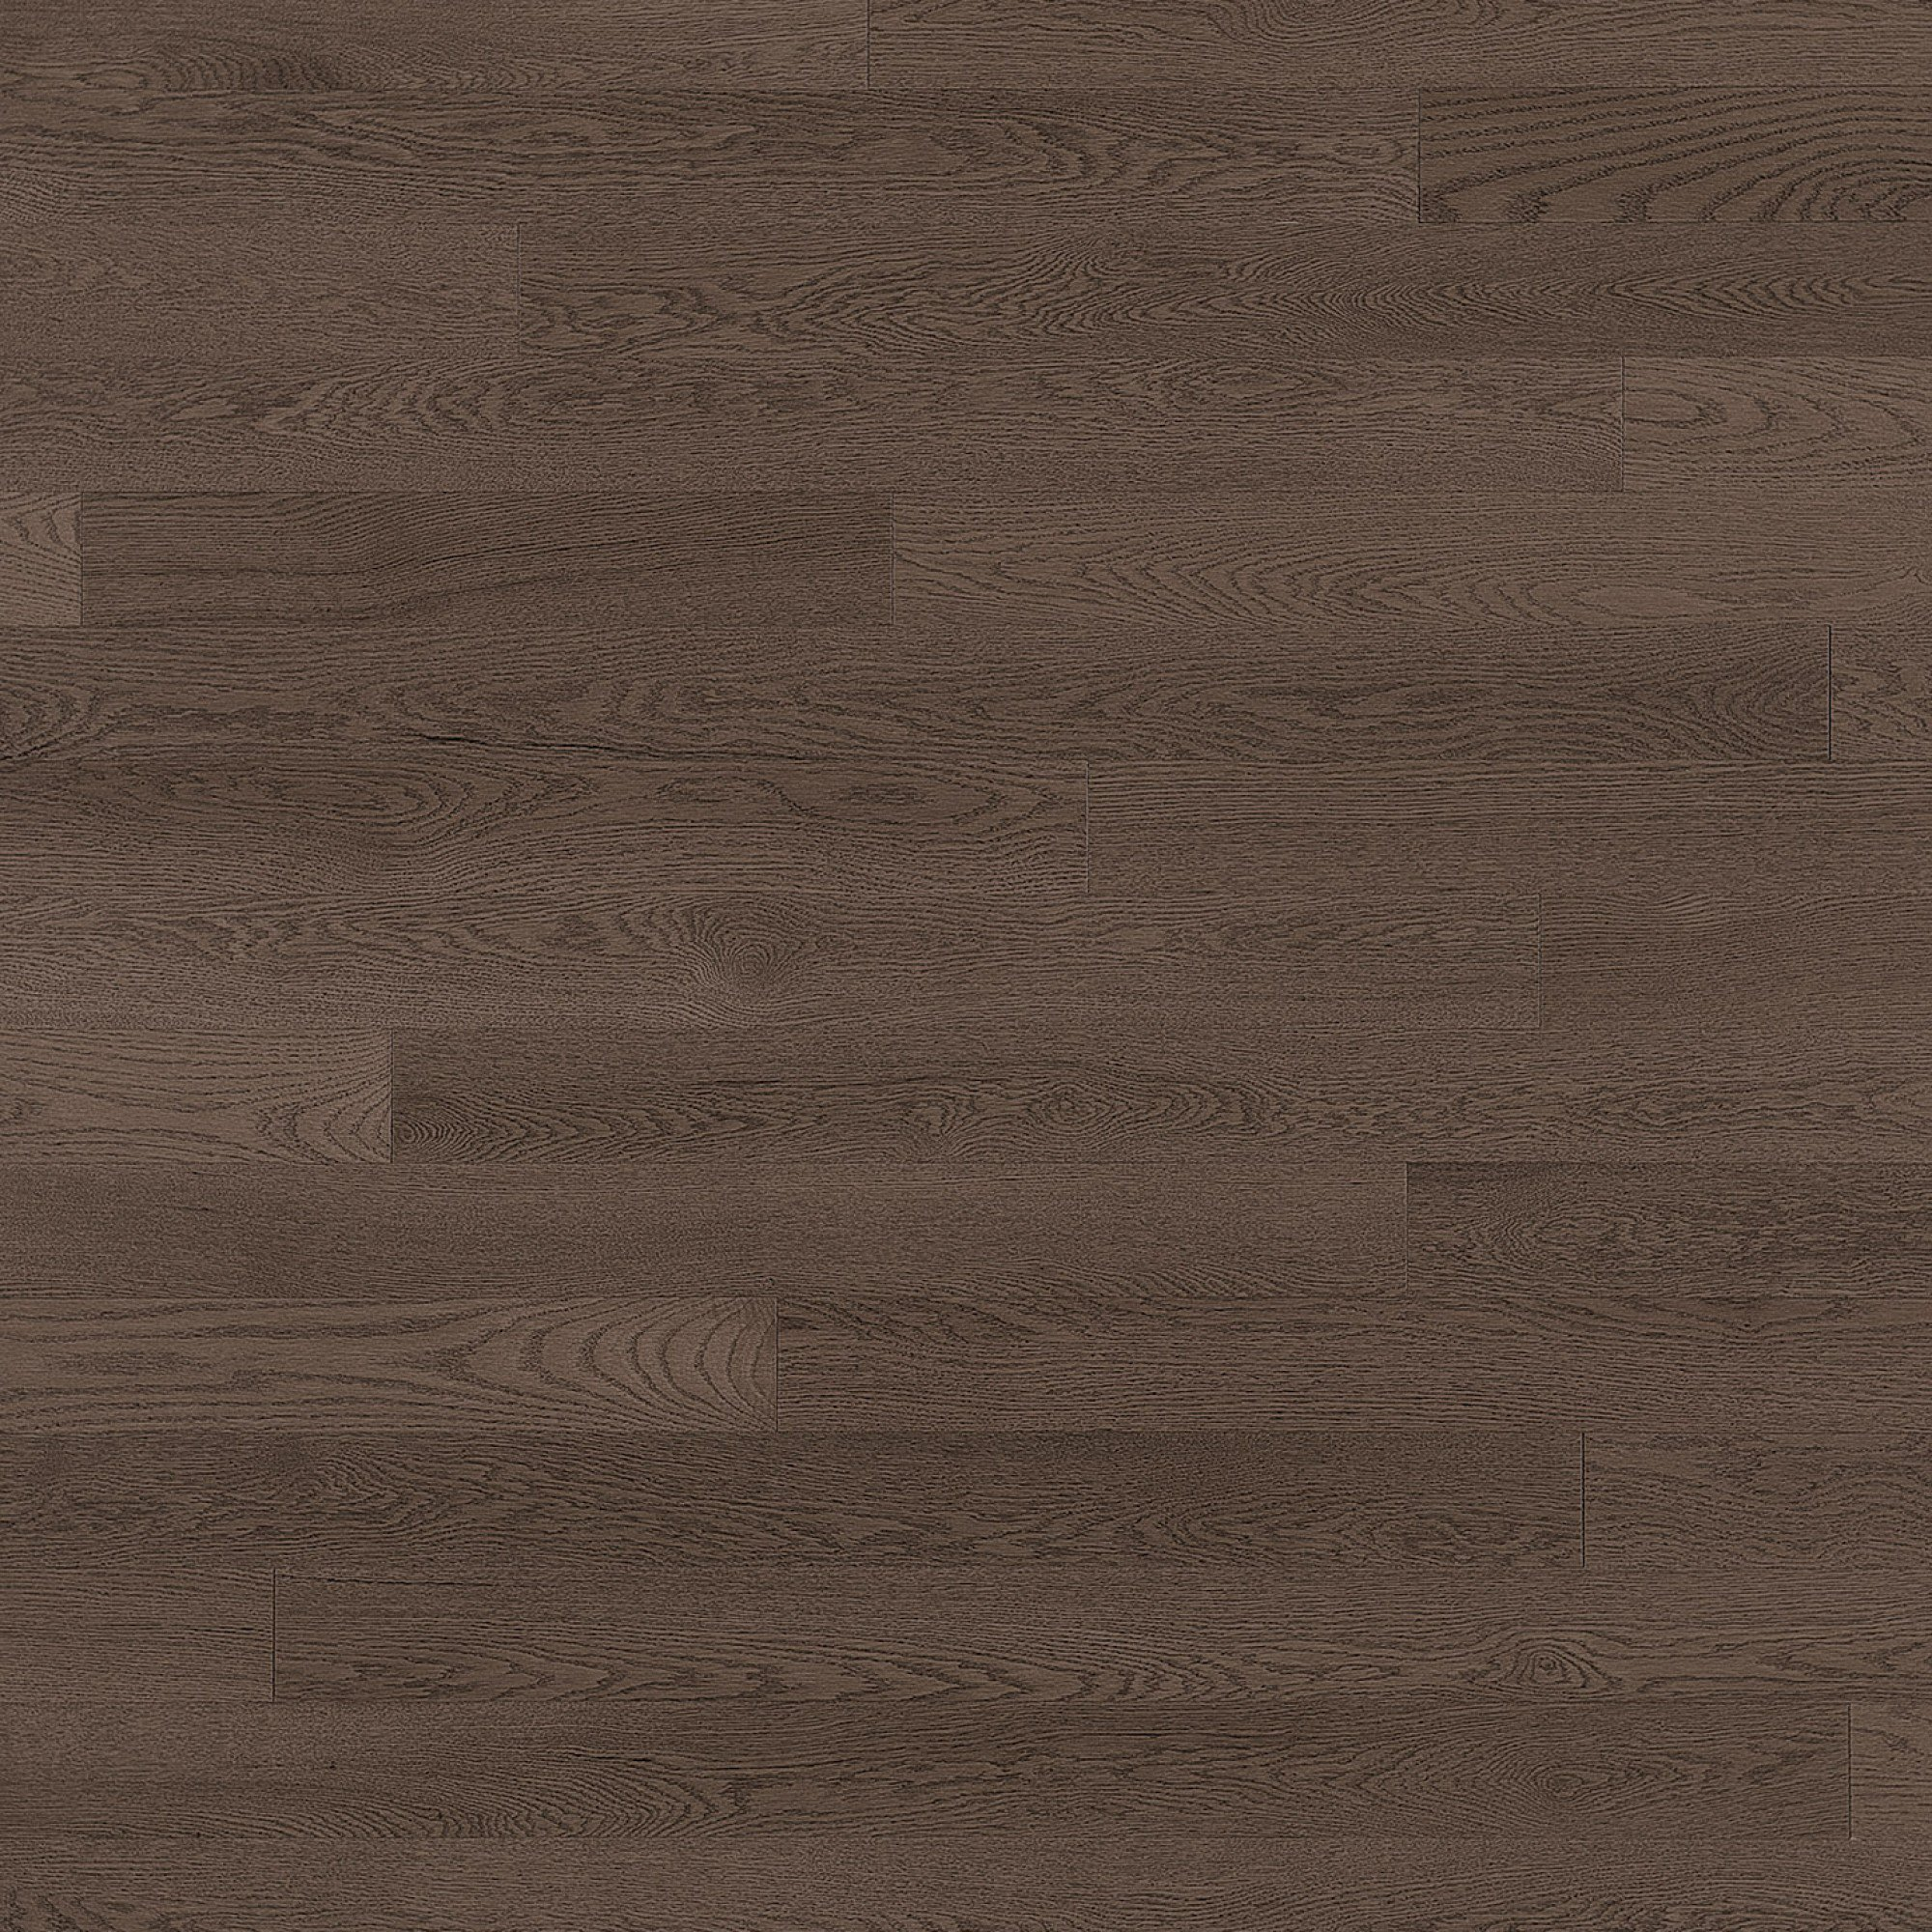 Alive Red Oak Eastman Mirage Hardwood Floors